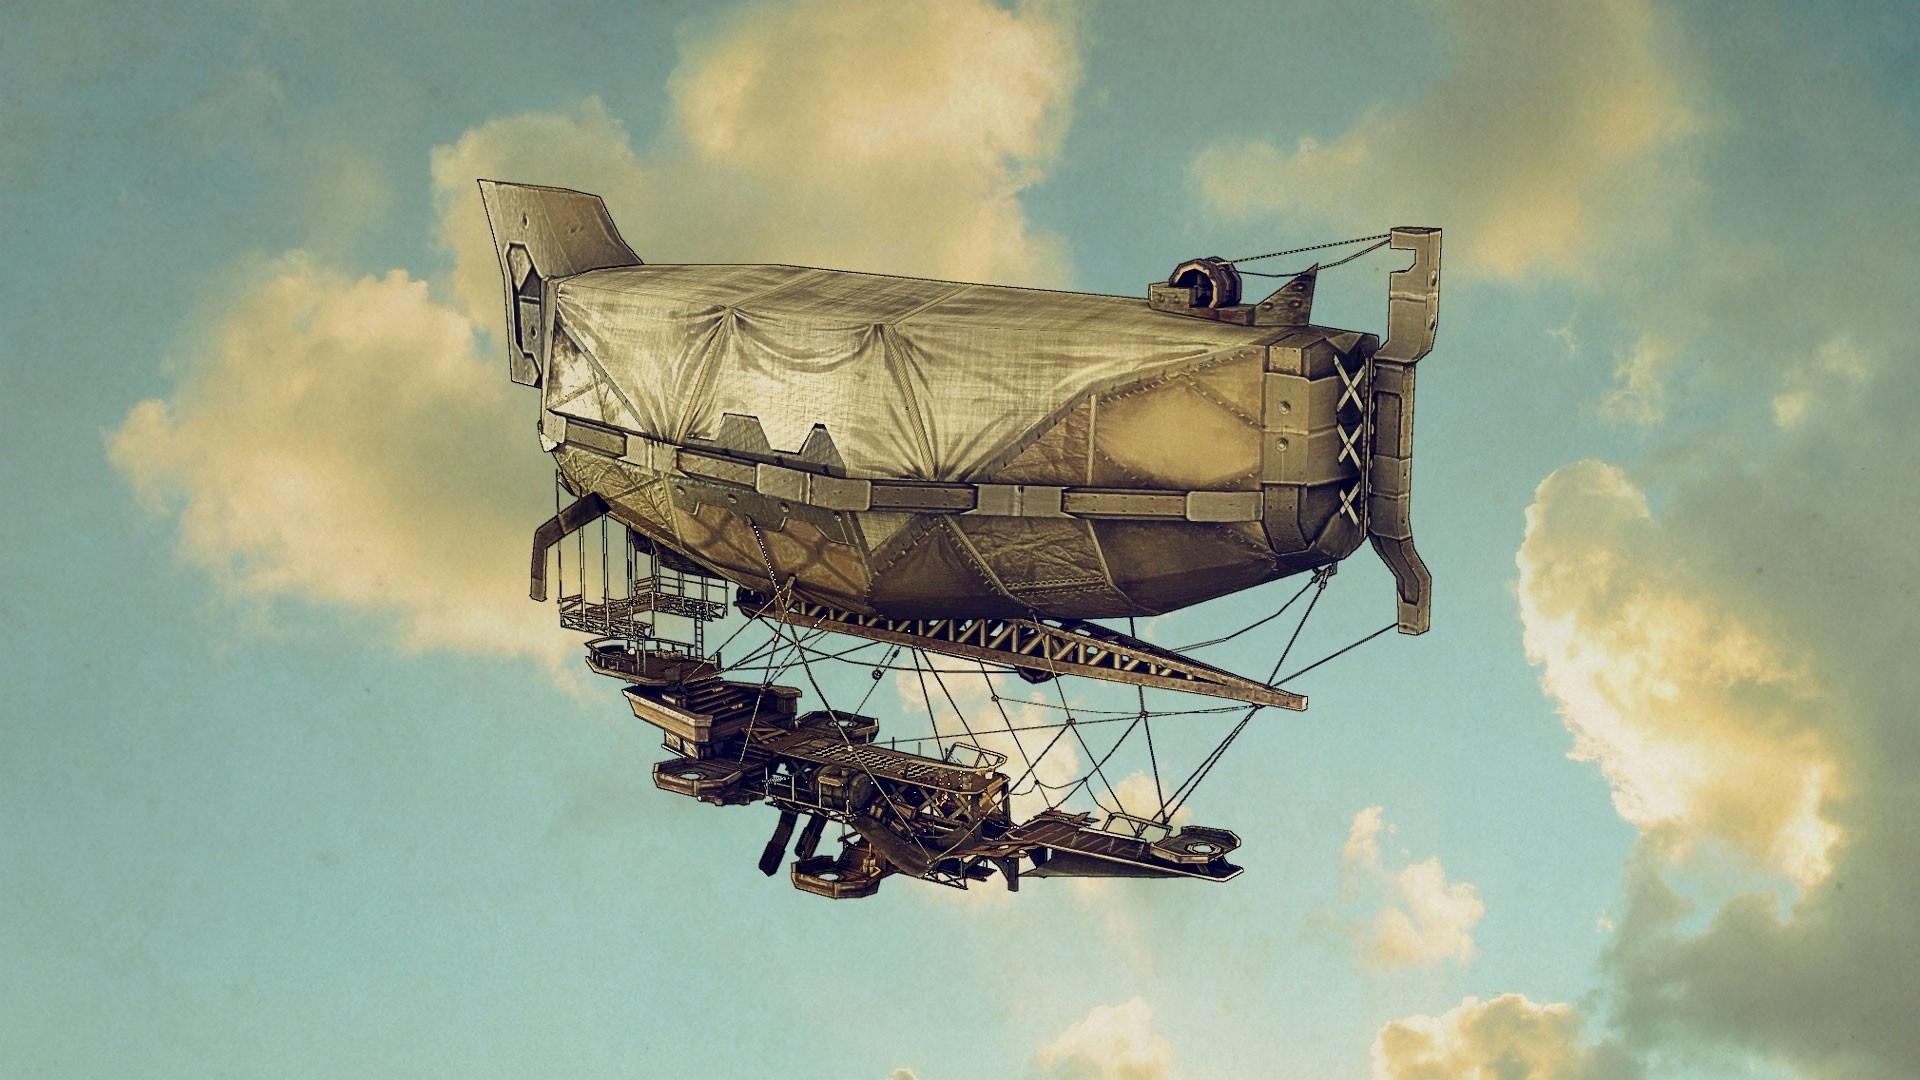 Airship Art wallpaper for pc